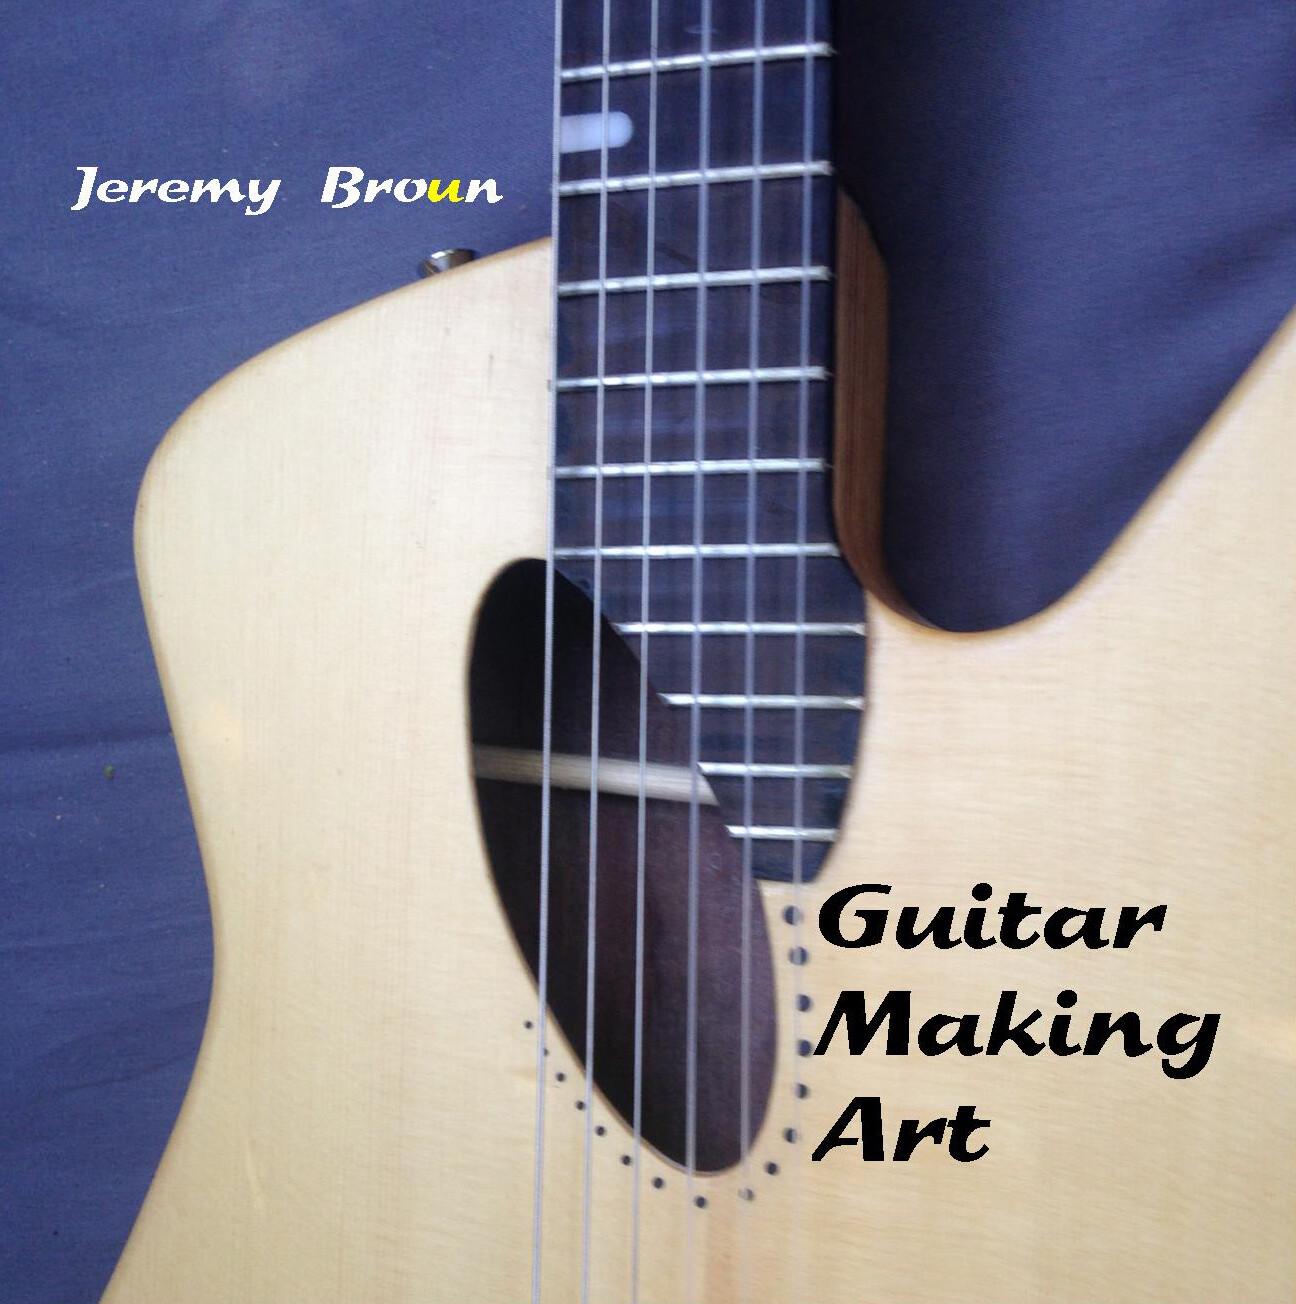 Guitar Making Art  - a fabulous new hardback book for the creative builder - including online videos & printout plans (via link).